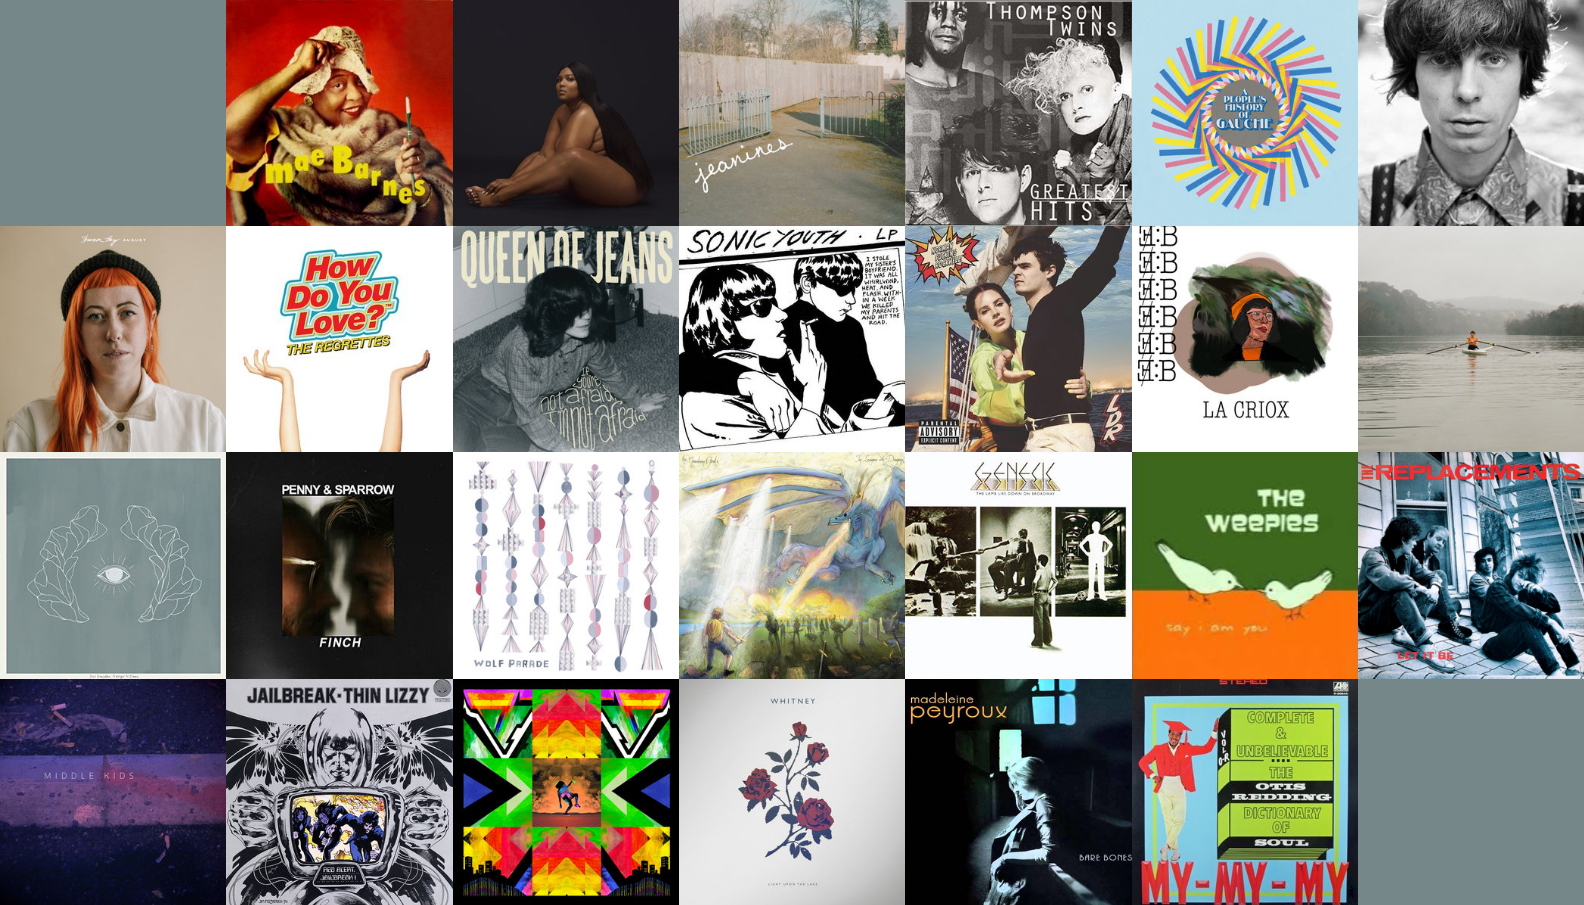 mosaic of album covers from Elan's September 2019 Mixtape